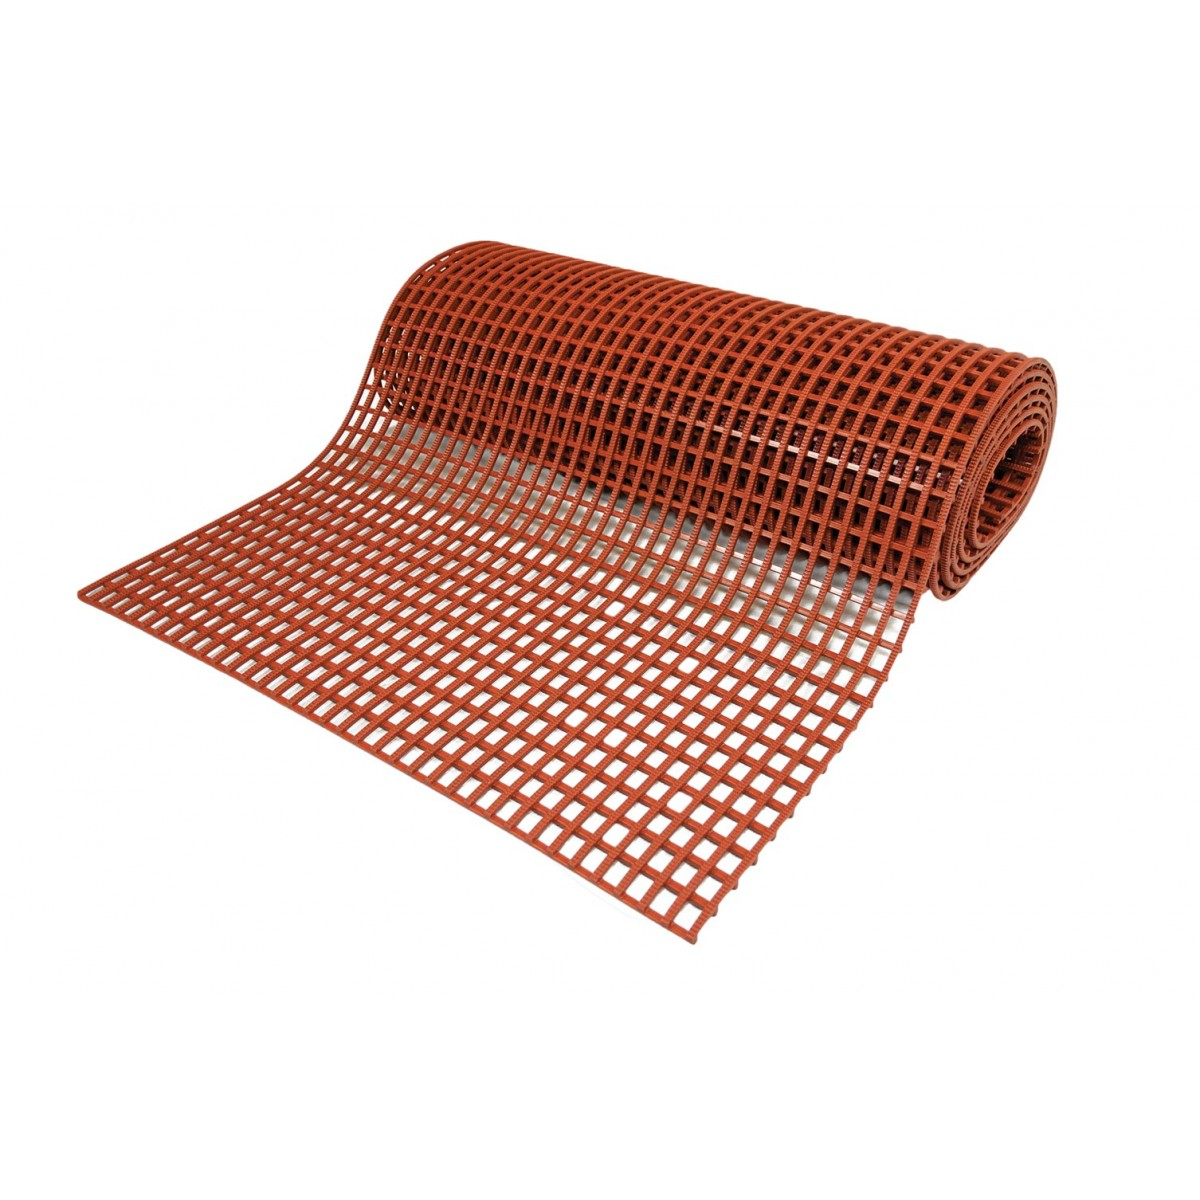 MacLellan Rubber's Elevate AFR FoodSafe non-slip matting